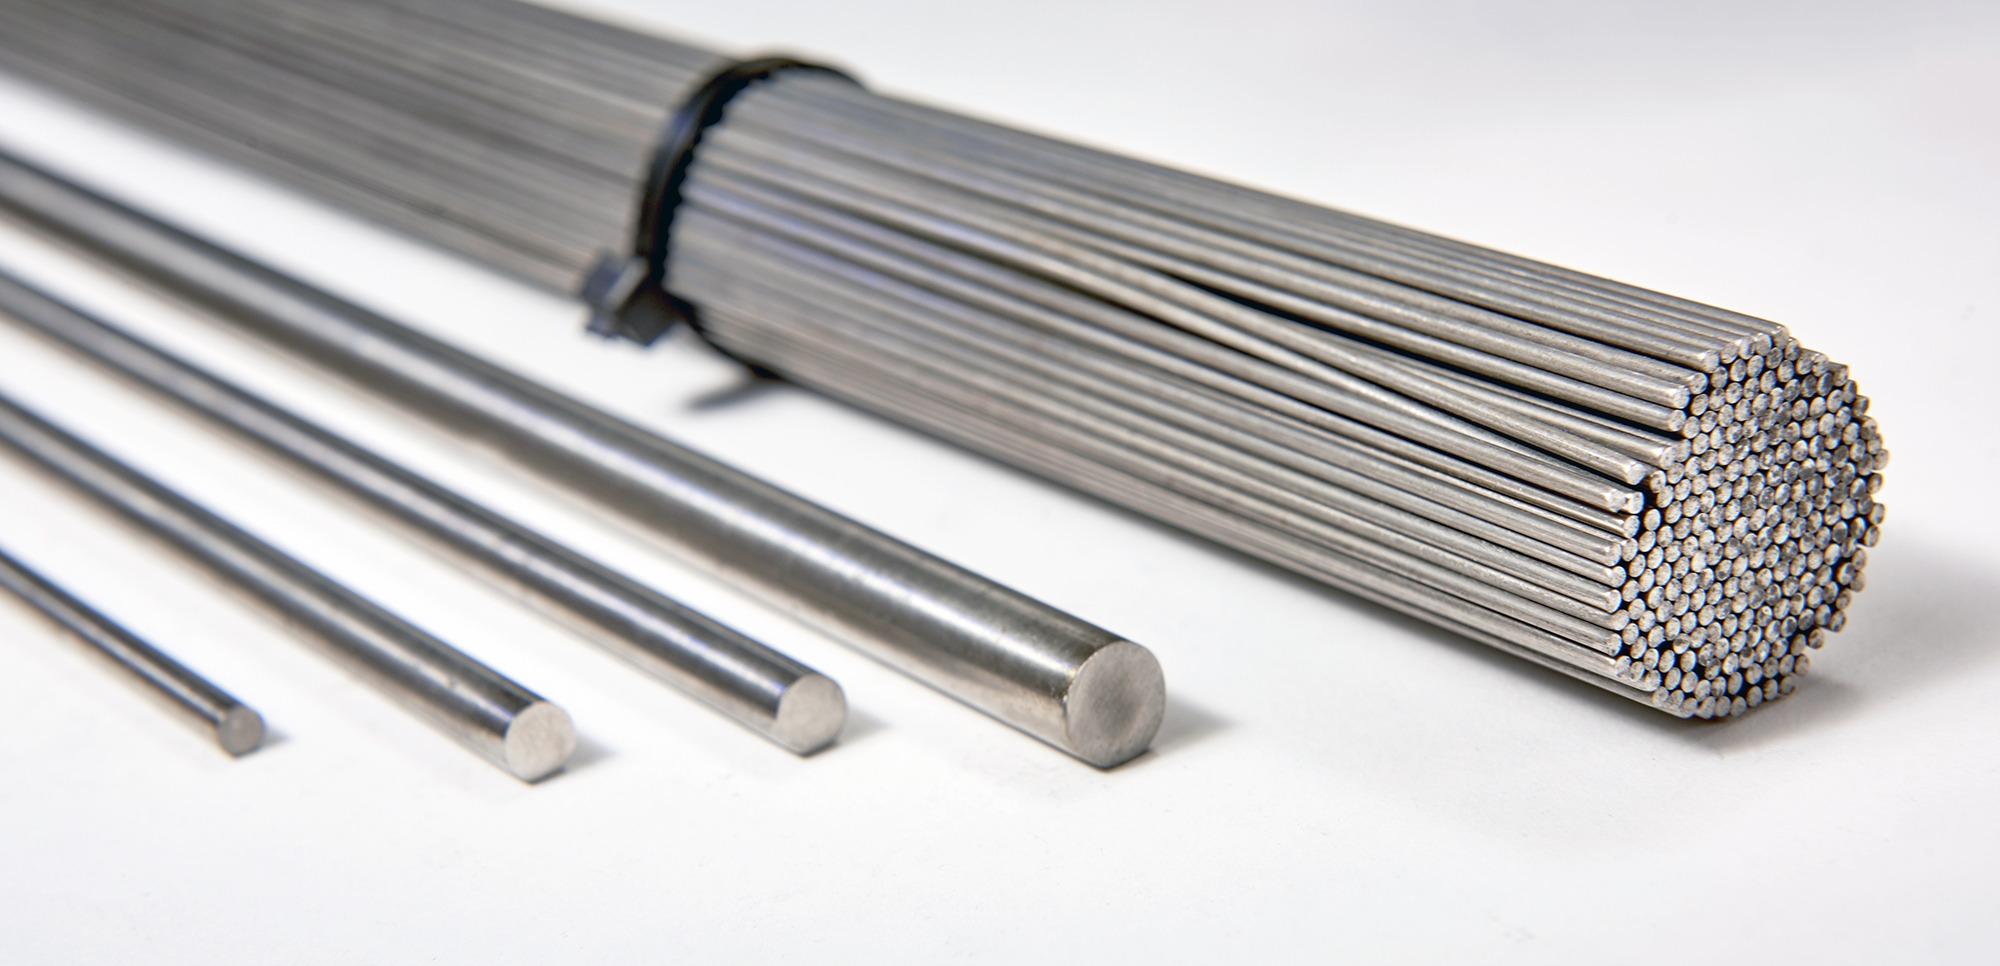 AlloyWire product 0045 Round wire Round Wire